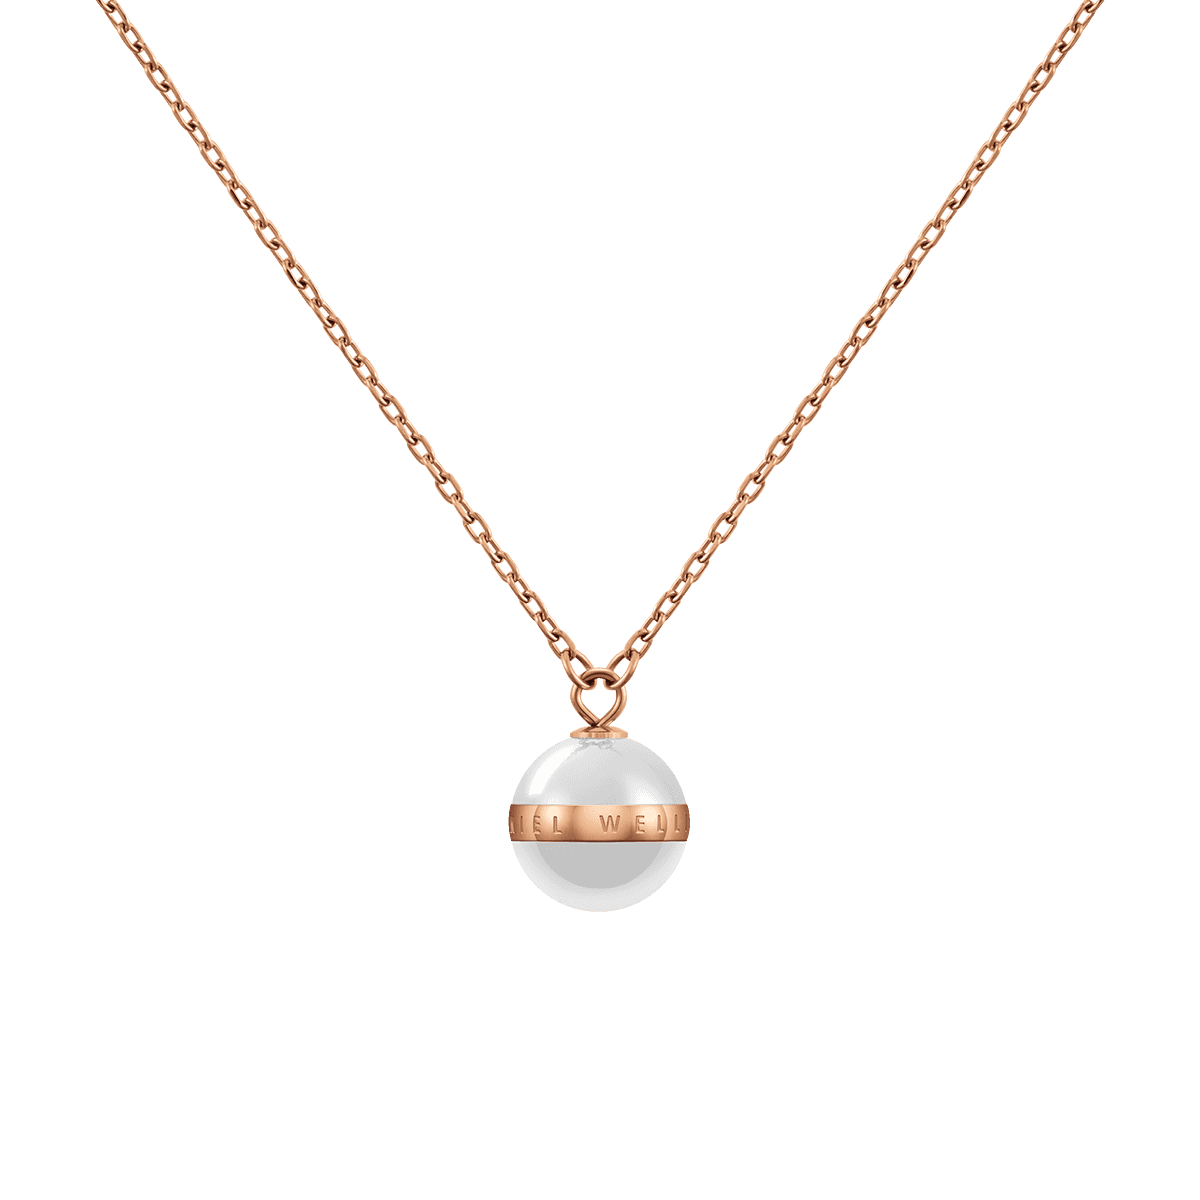 Aspiration Necklace Rose Gold Satin White One Size